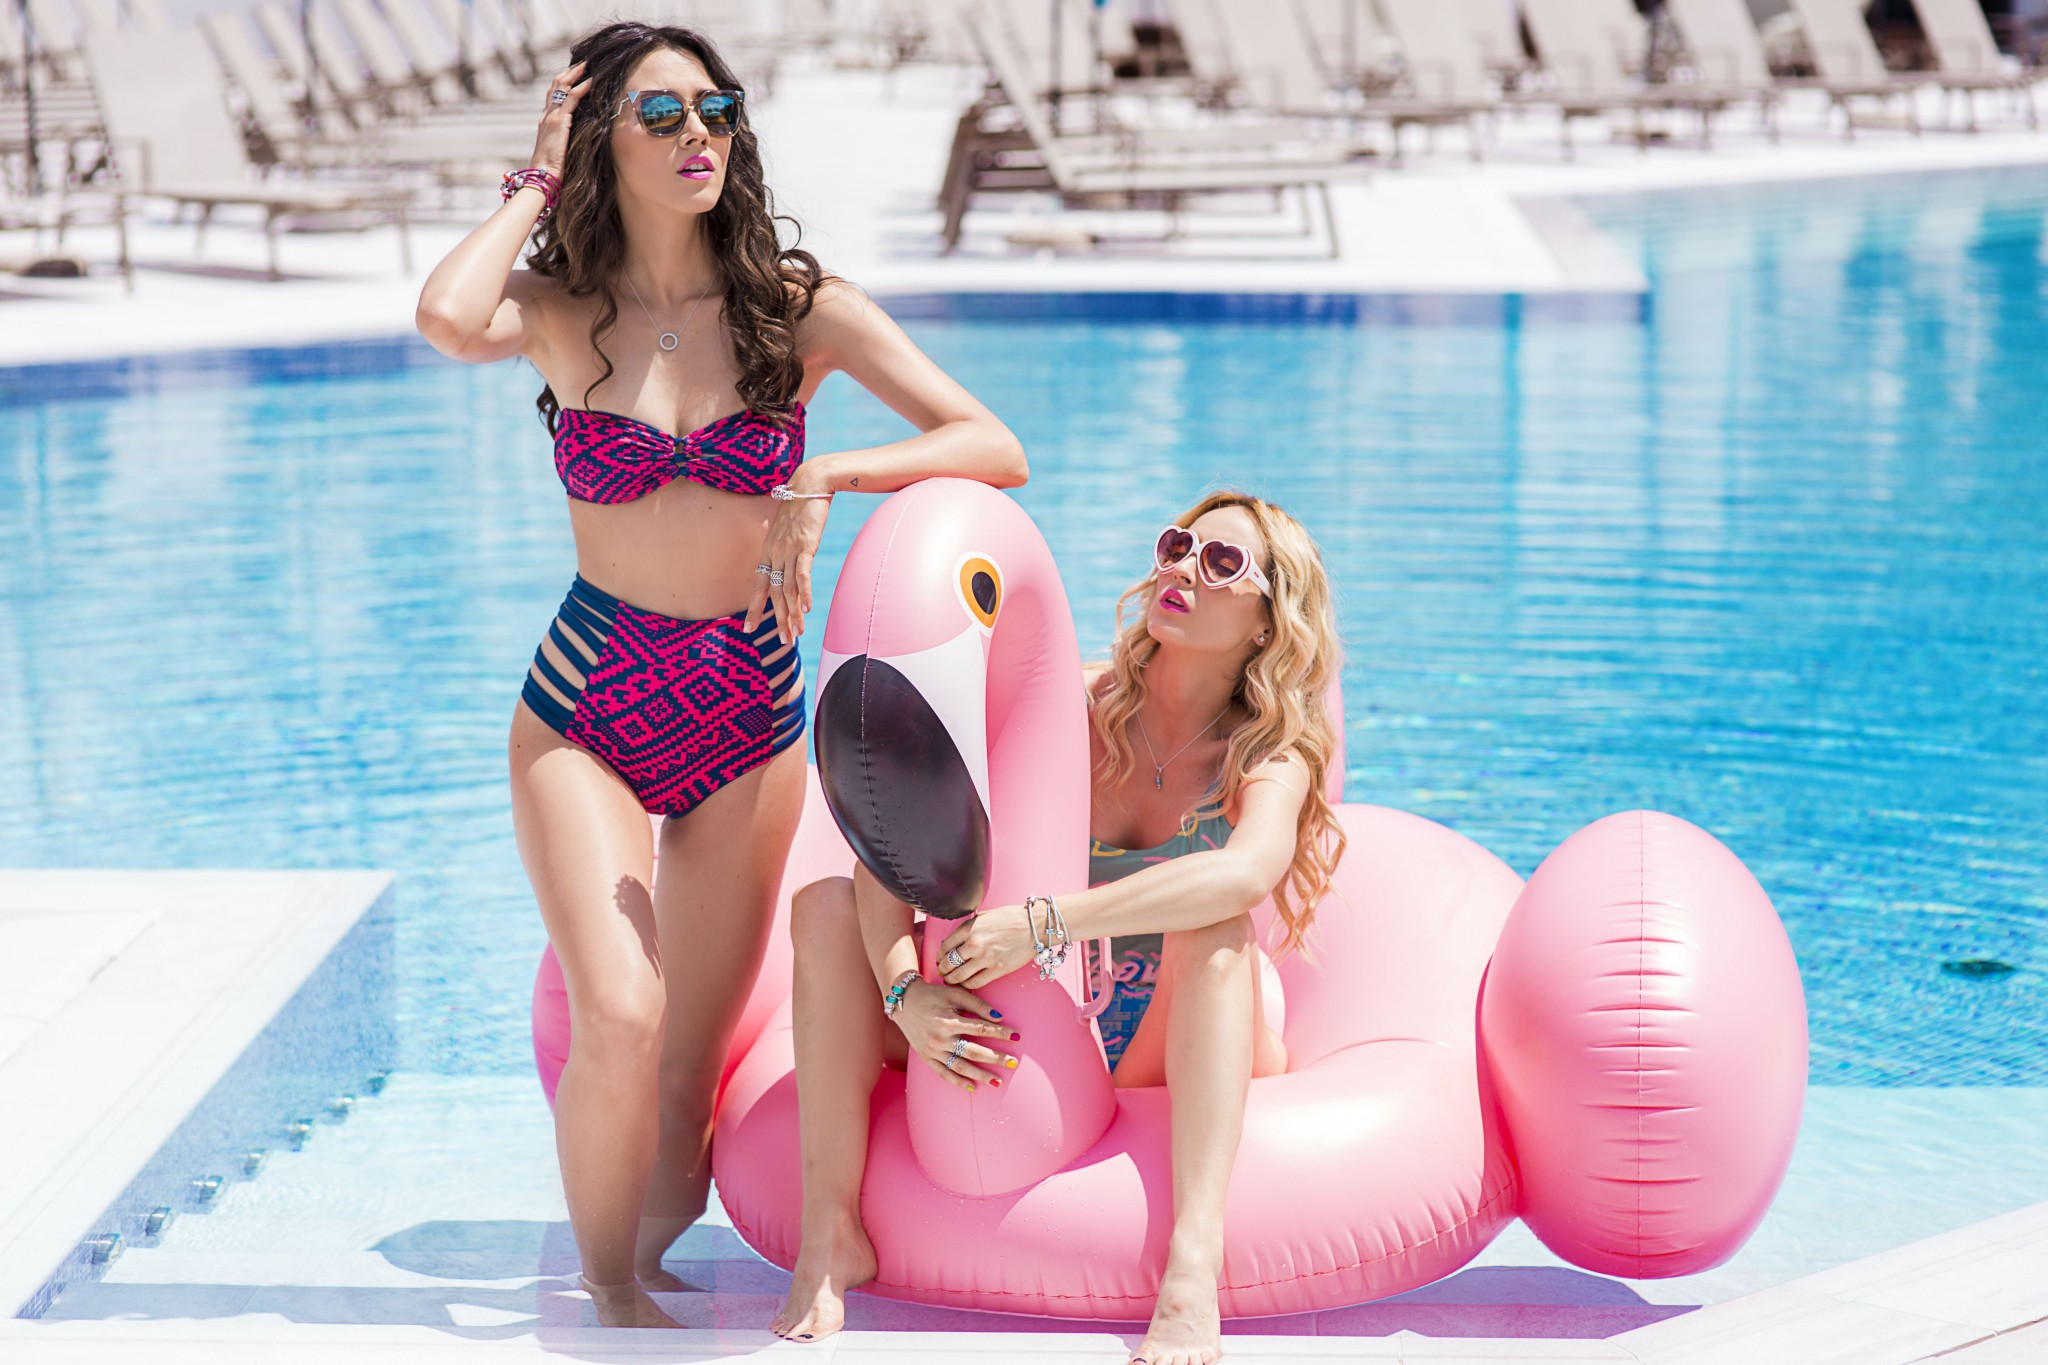 0fabulous_muses_pandora_summer2016_collection_youniverse_piscina